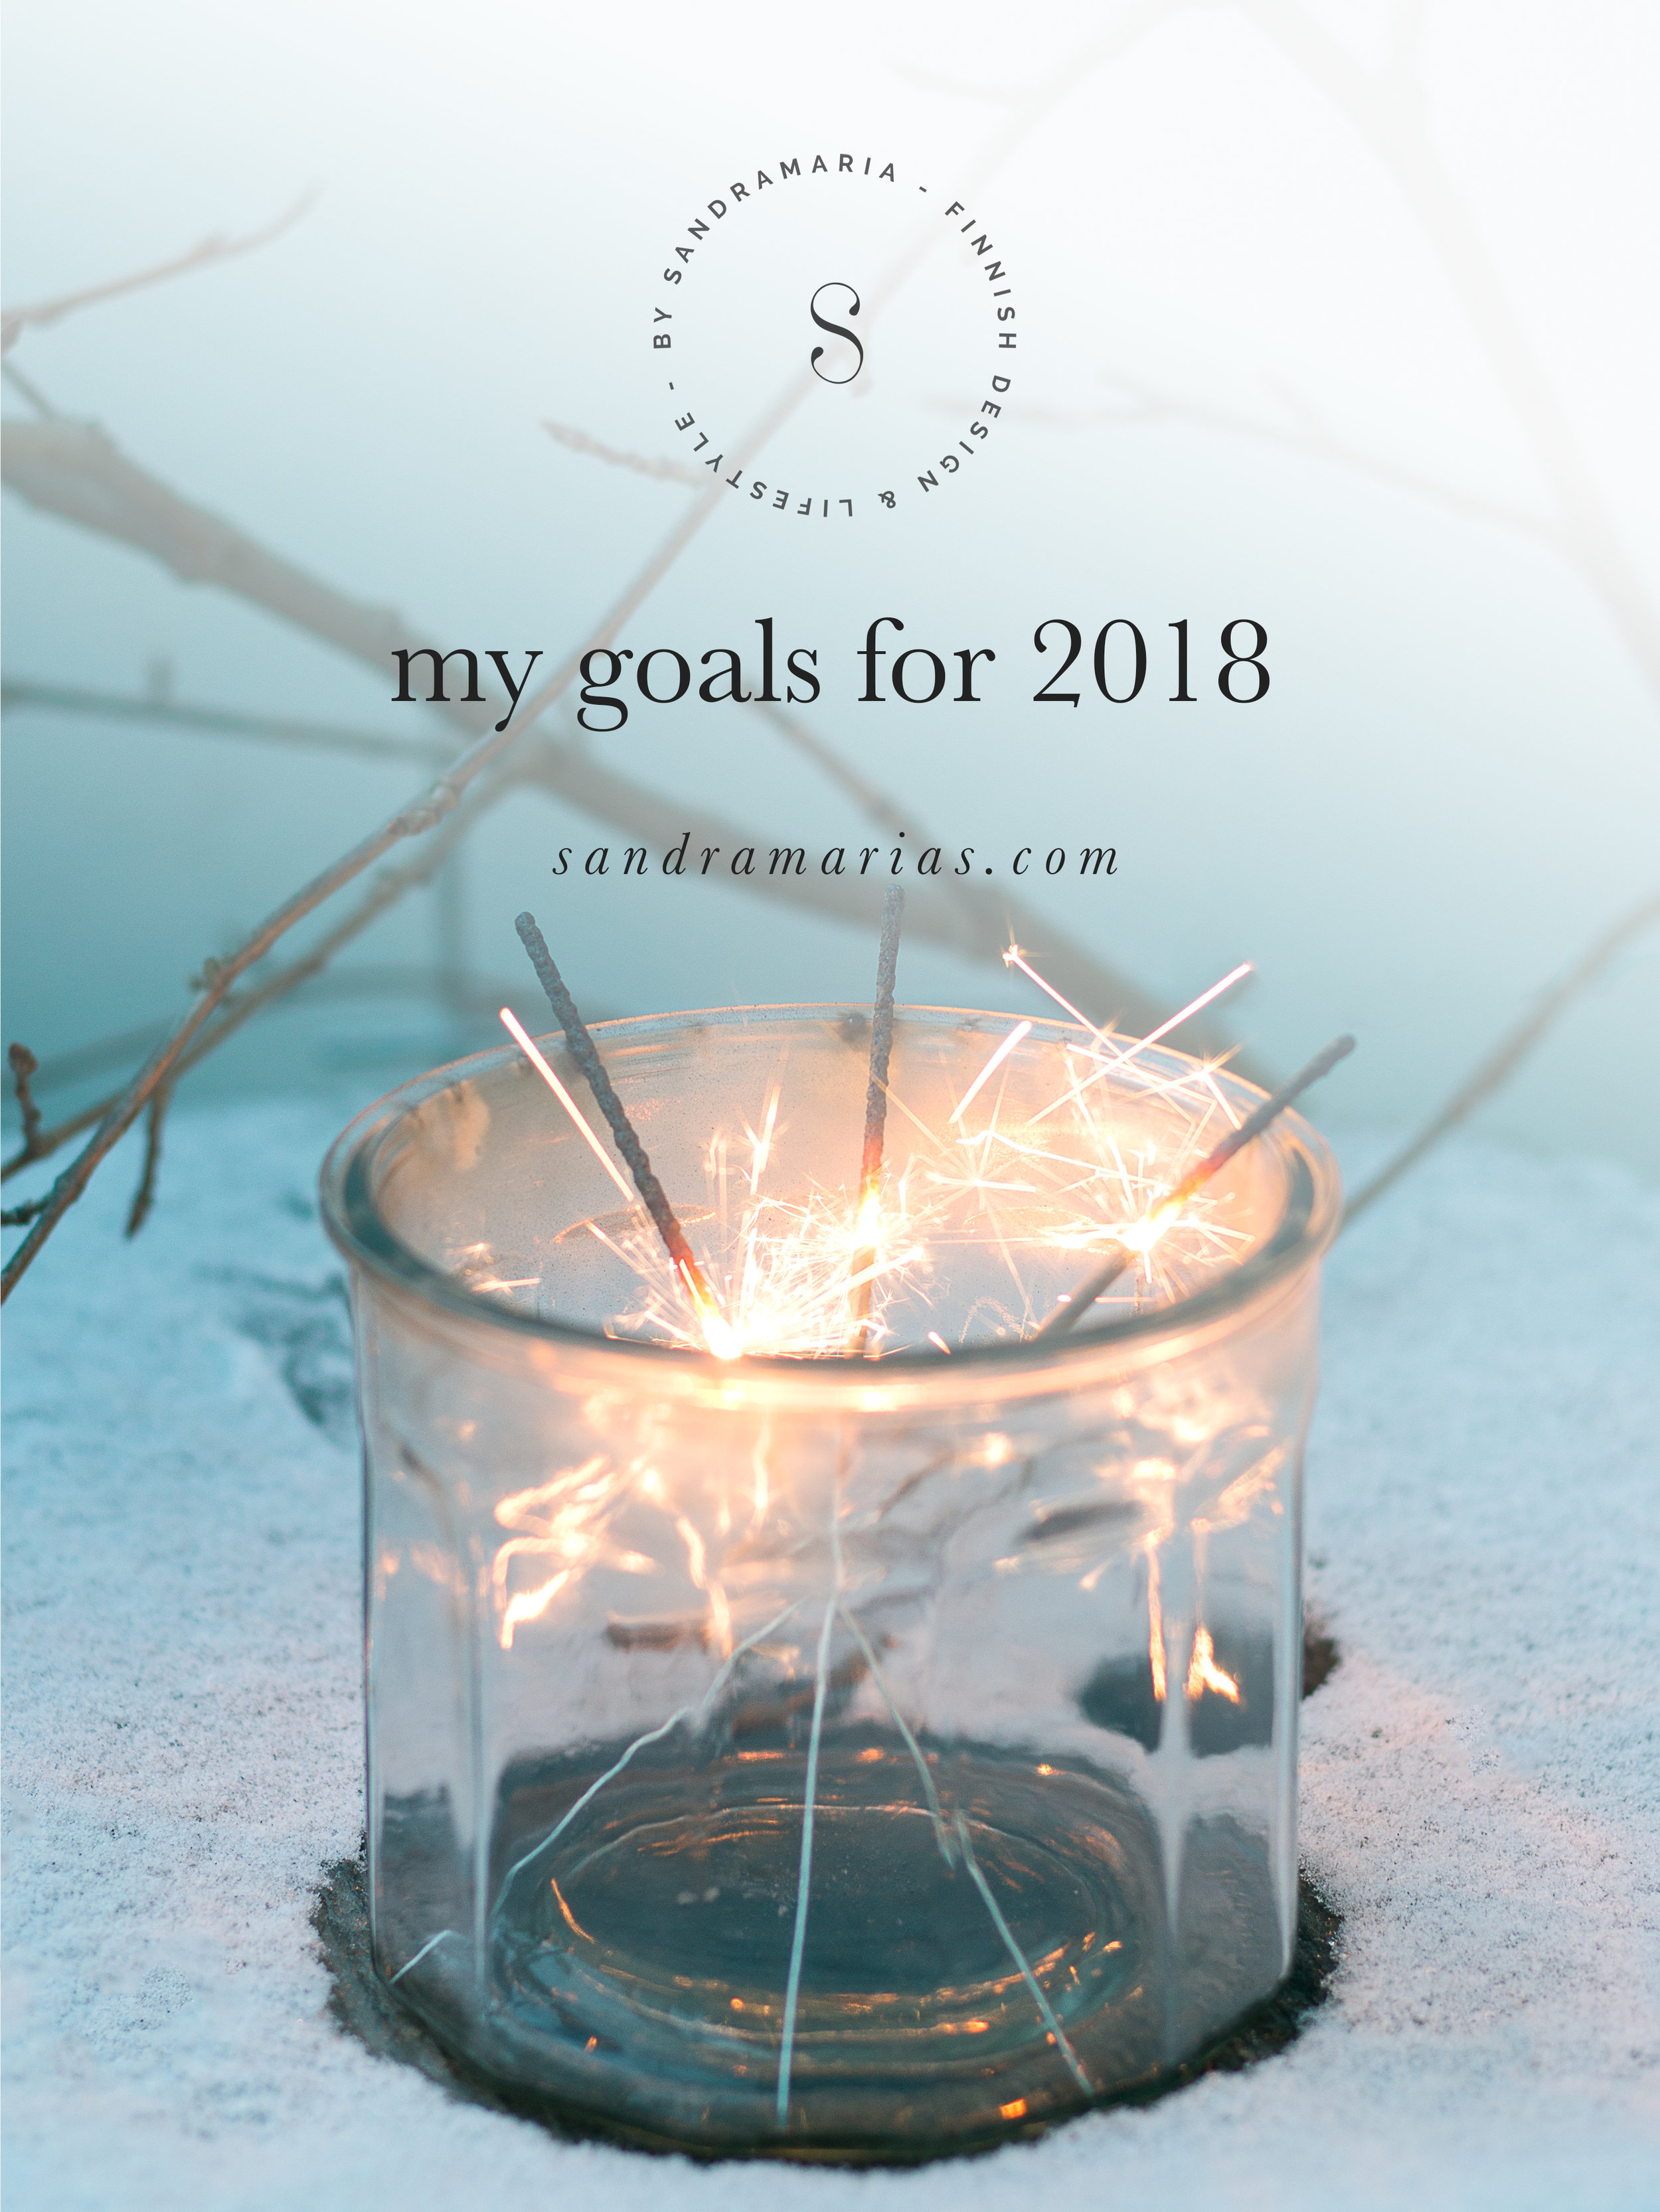 My goals for 2018 | Sandramarias.com | Happy New Year by Sandramaria